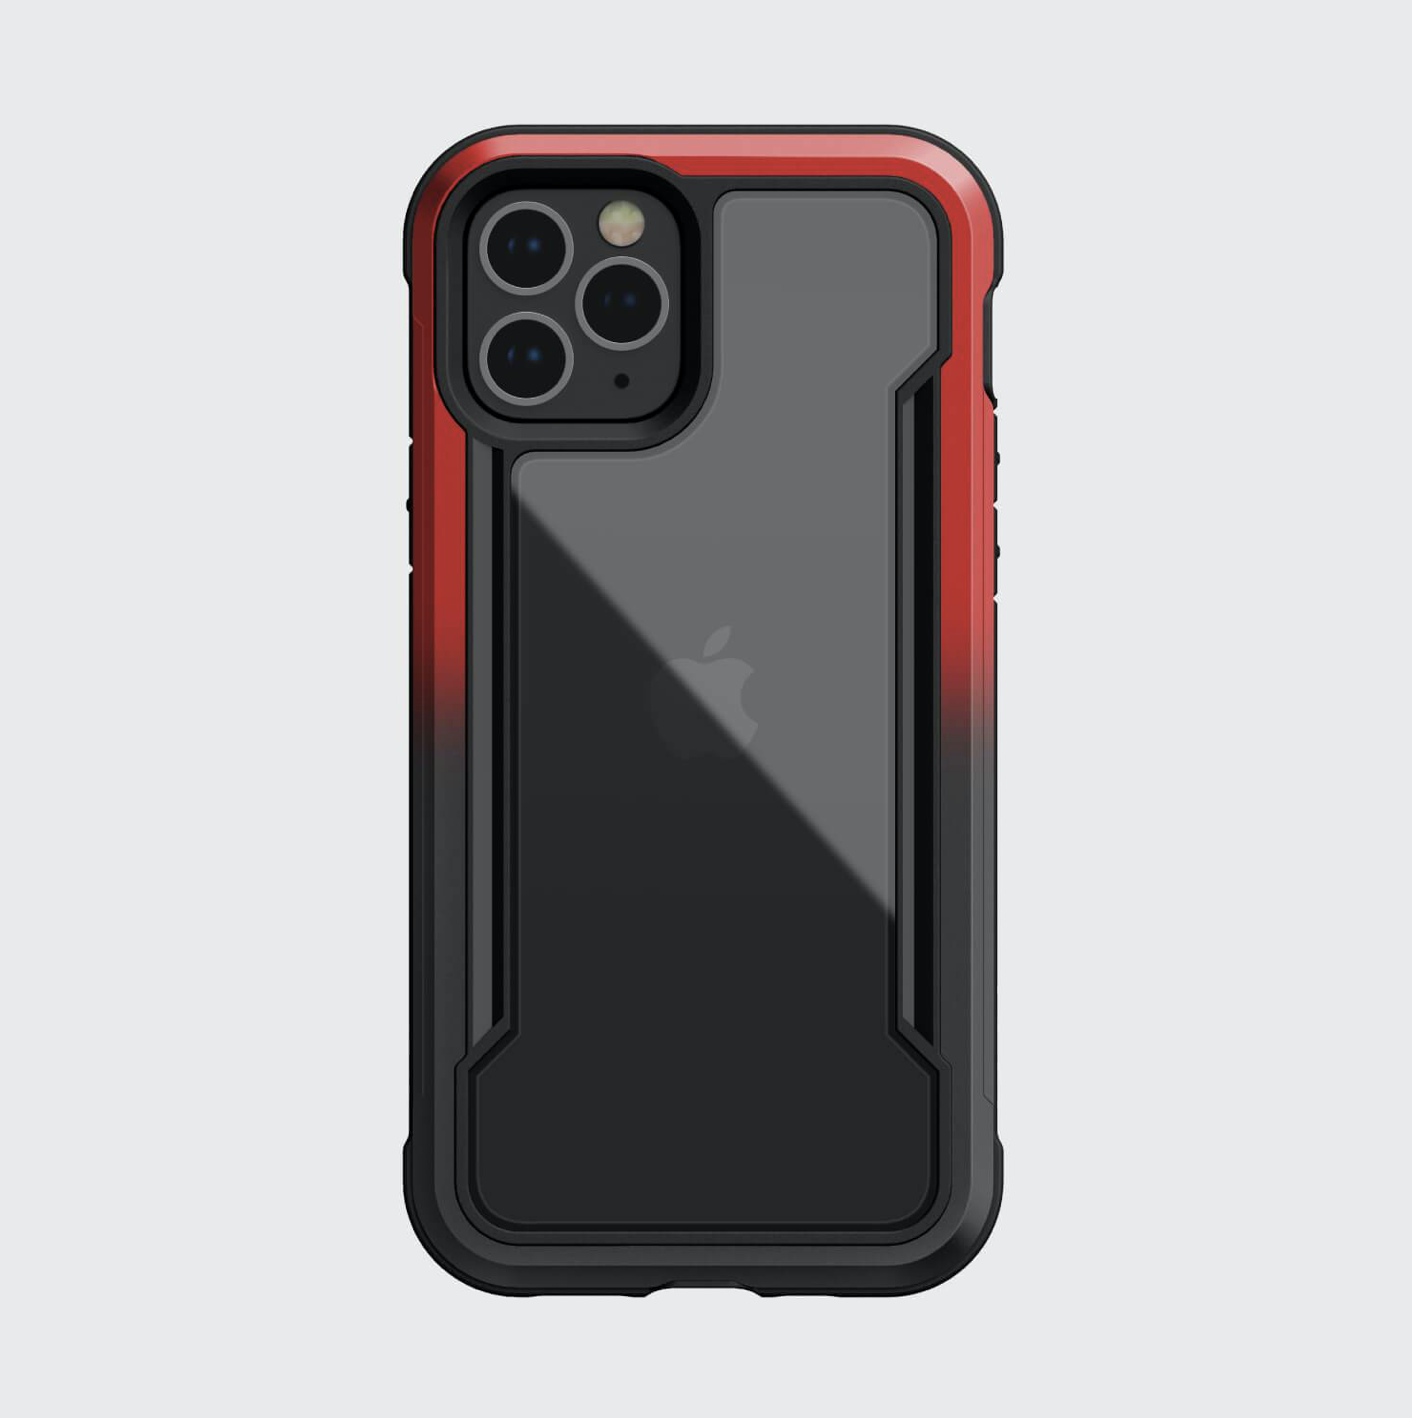 Estuche XDORIA Raptic Shield Negro / Rojo - IPHONE 12 PRO MAX 6.7